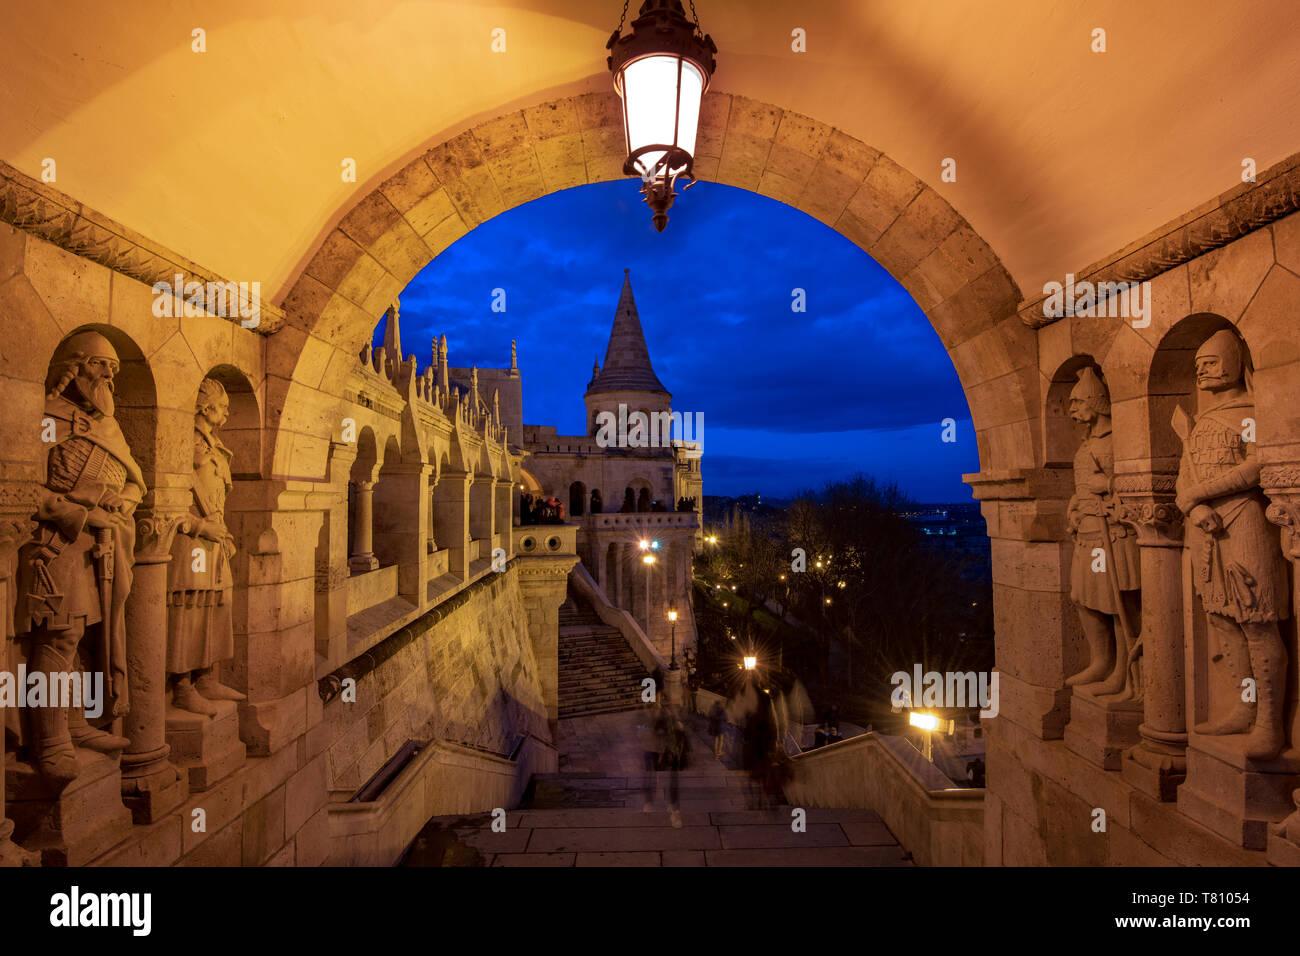 The Fishermans Bastion at night, UNESCO World Heritage Site, Budapest, Hungary, Europe Stock Photo